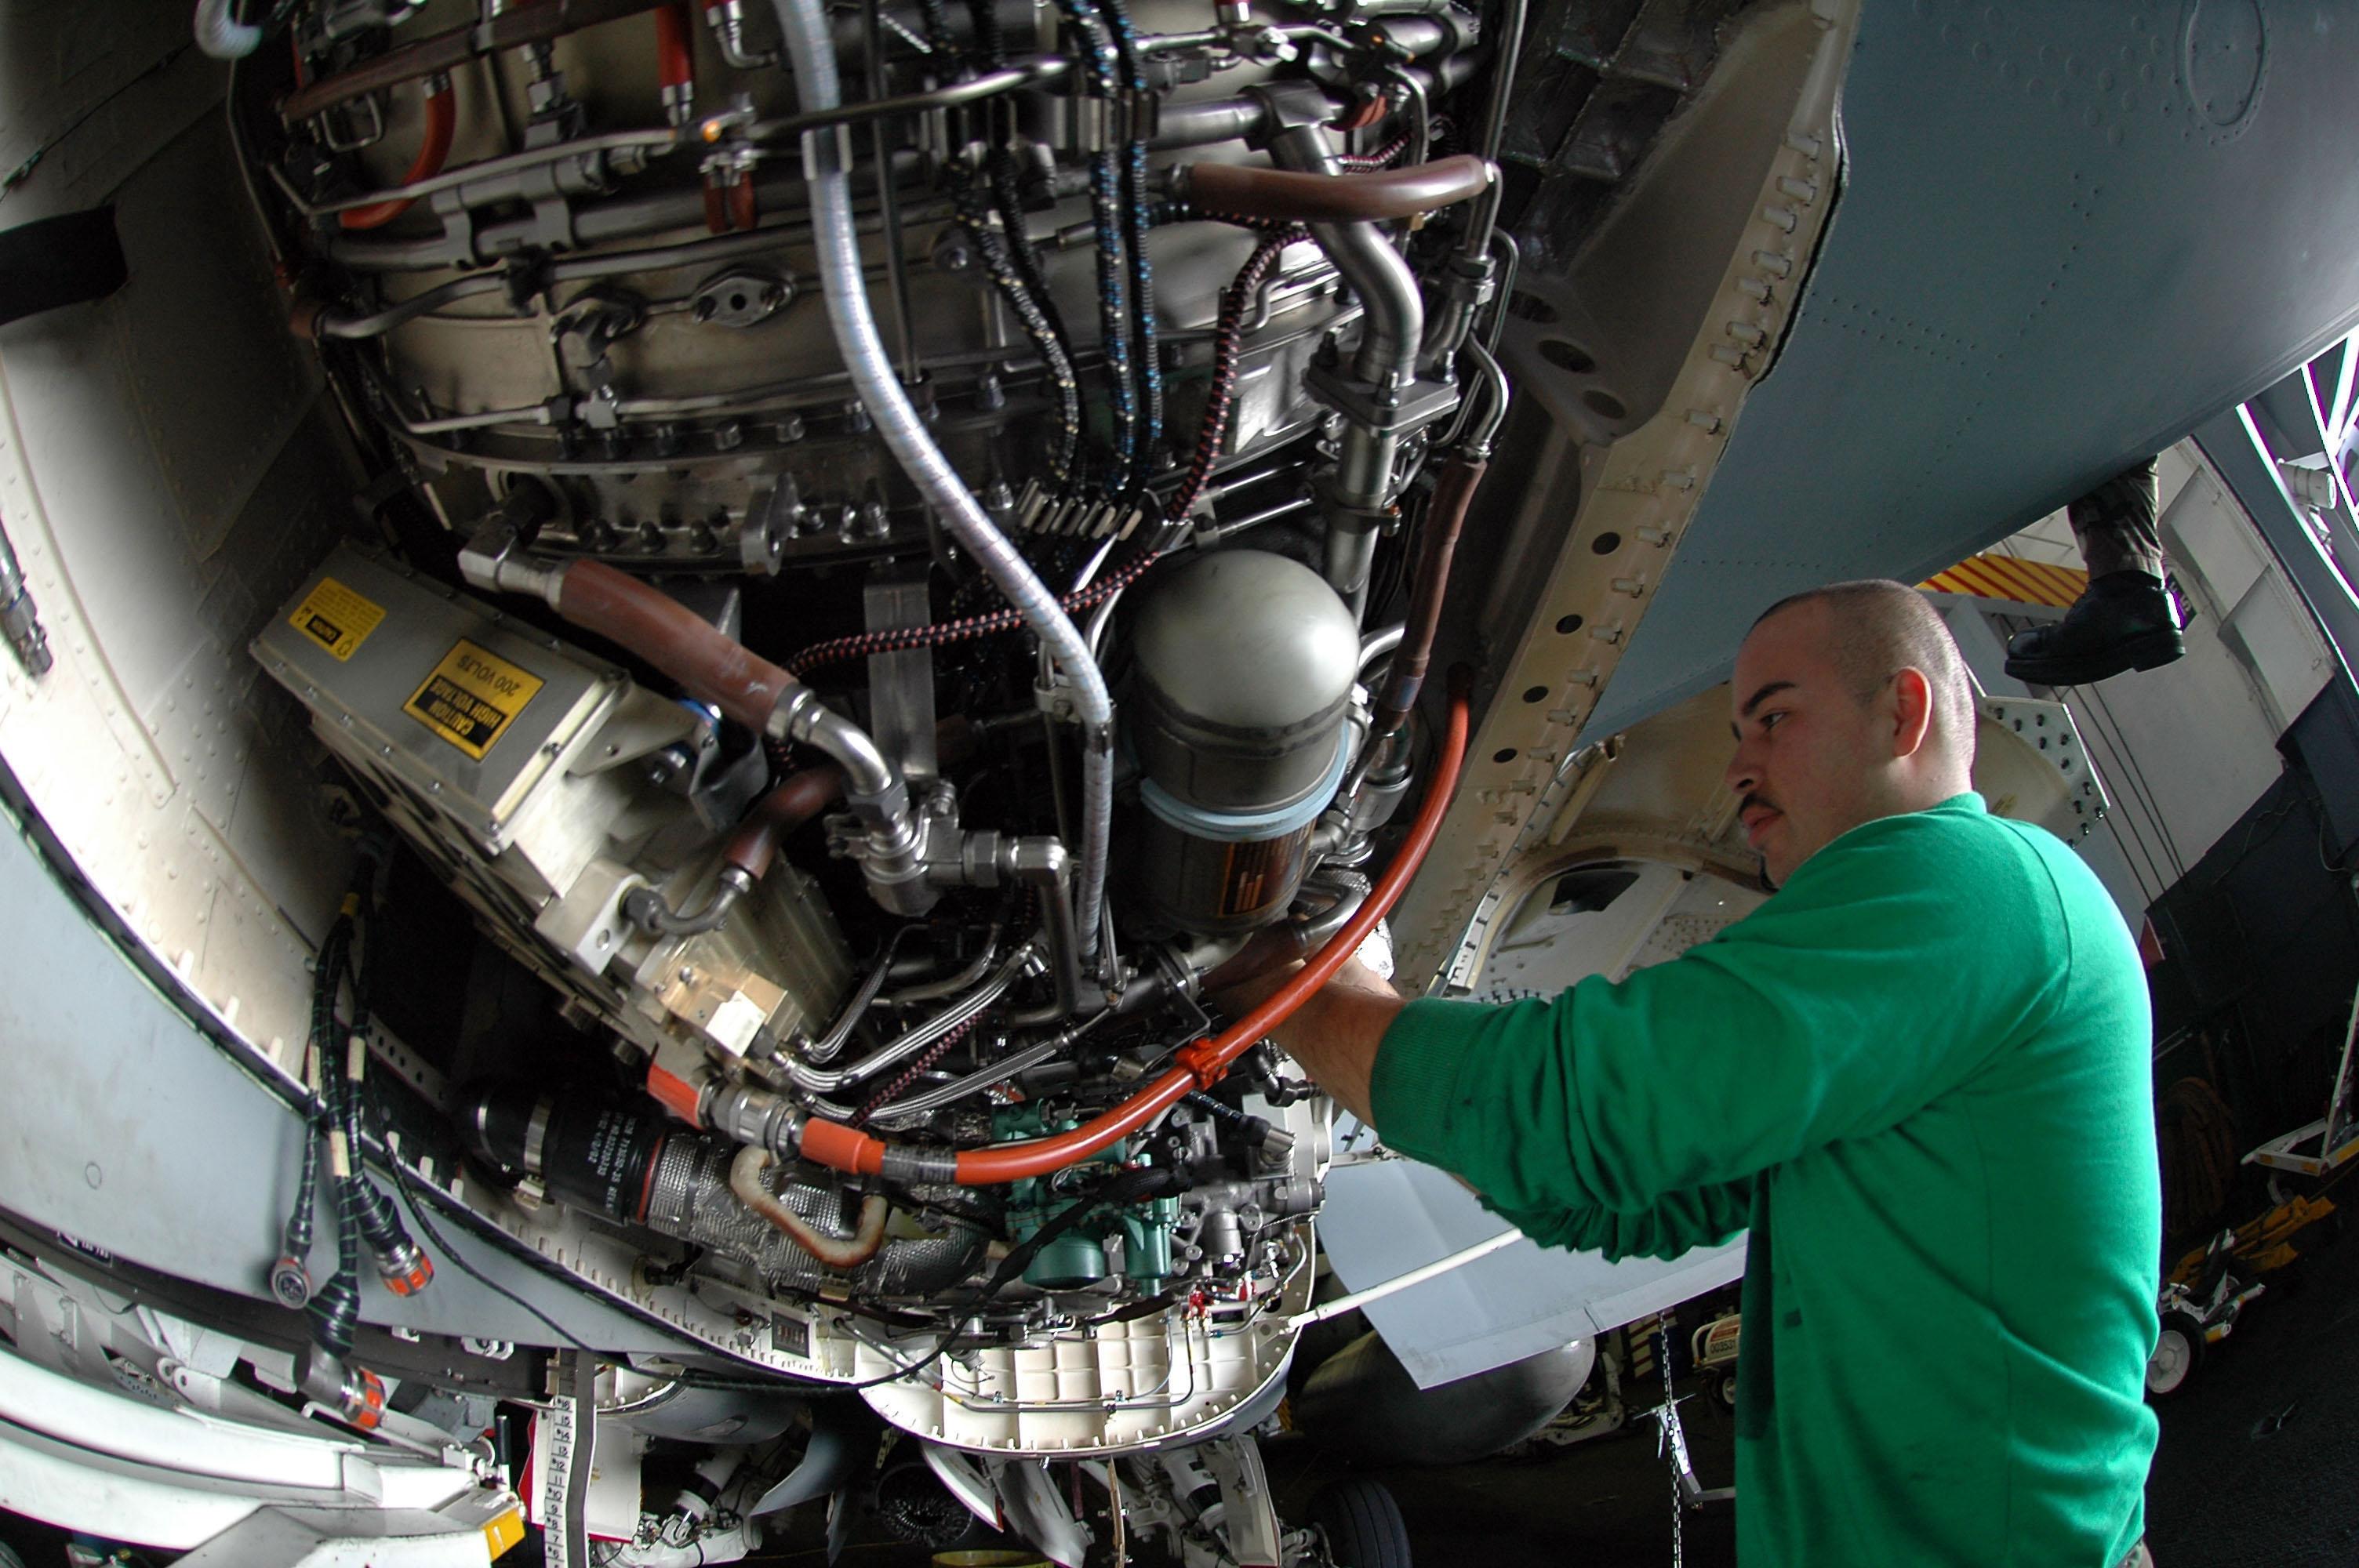 fileus navy 041214 n 9319h 016 aviation machinists mate 3rd class